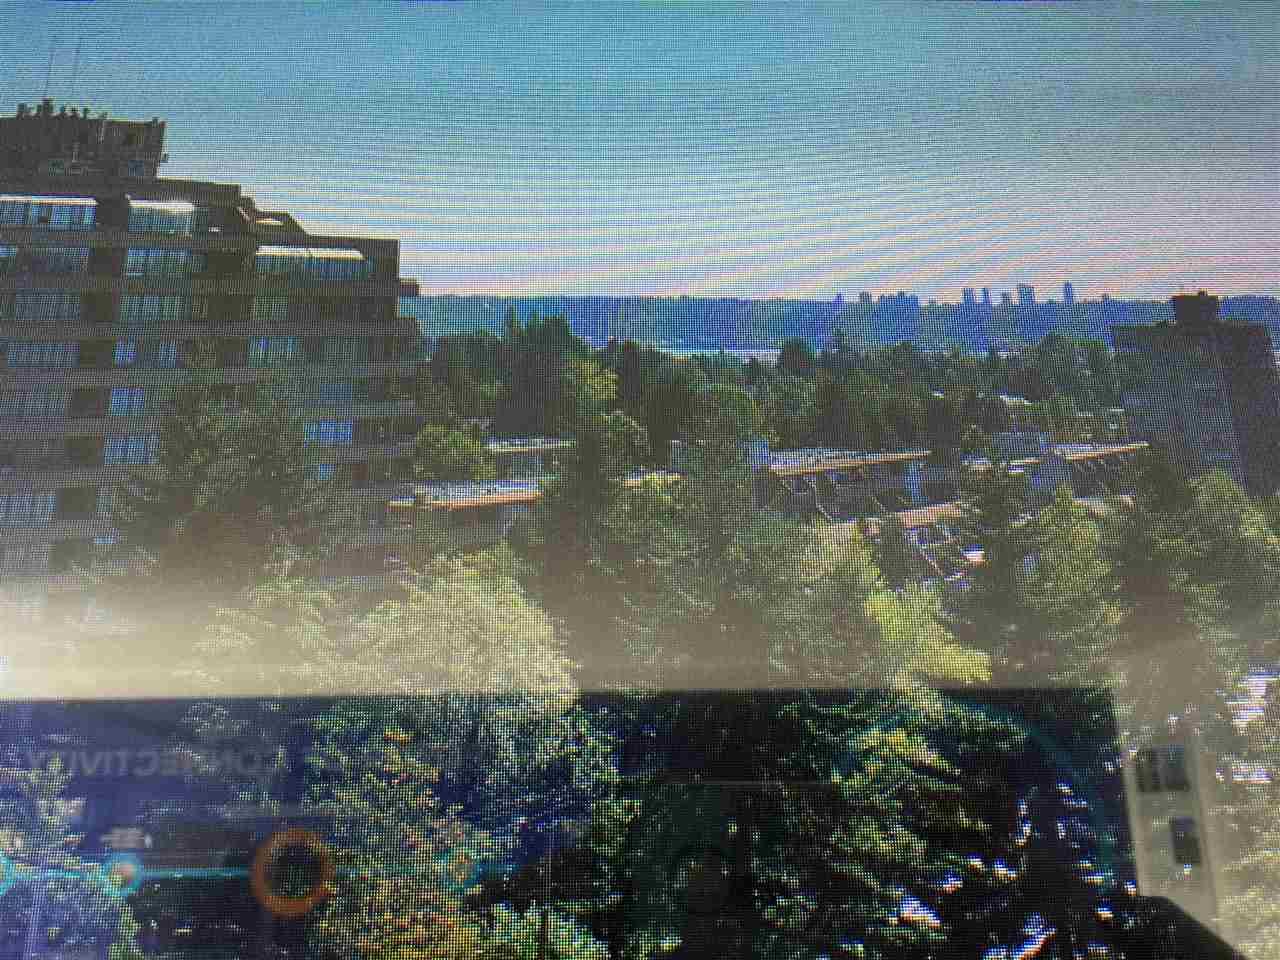 Condo Apartment at 1407 518 WHITING WAY, Unit 1407, Coquitlam, British Columbia. Image 3